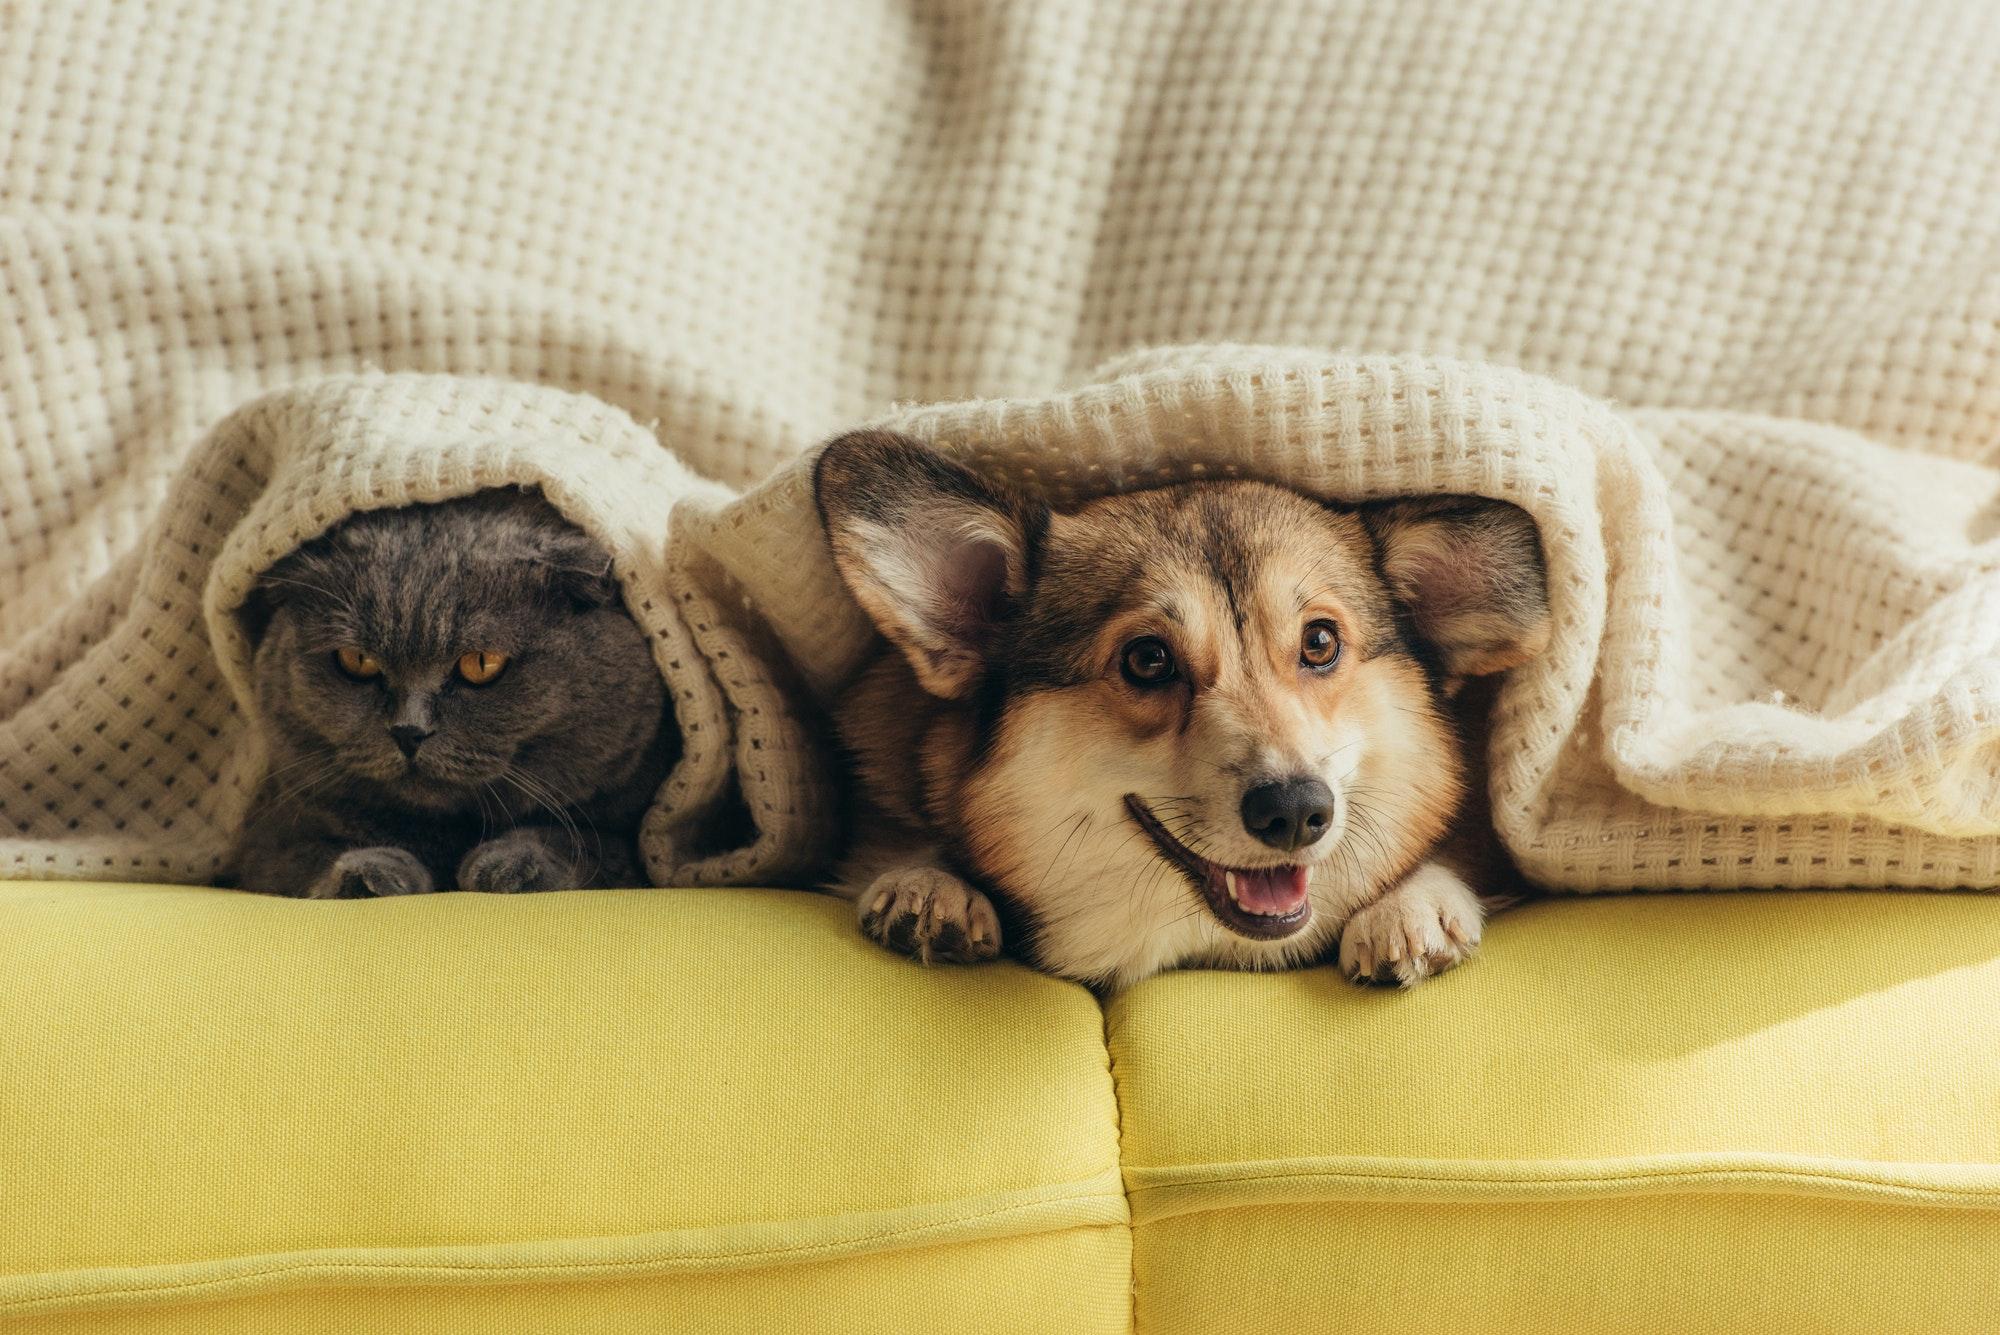 cat and dog lying under plaid on sofa